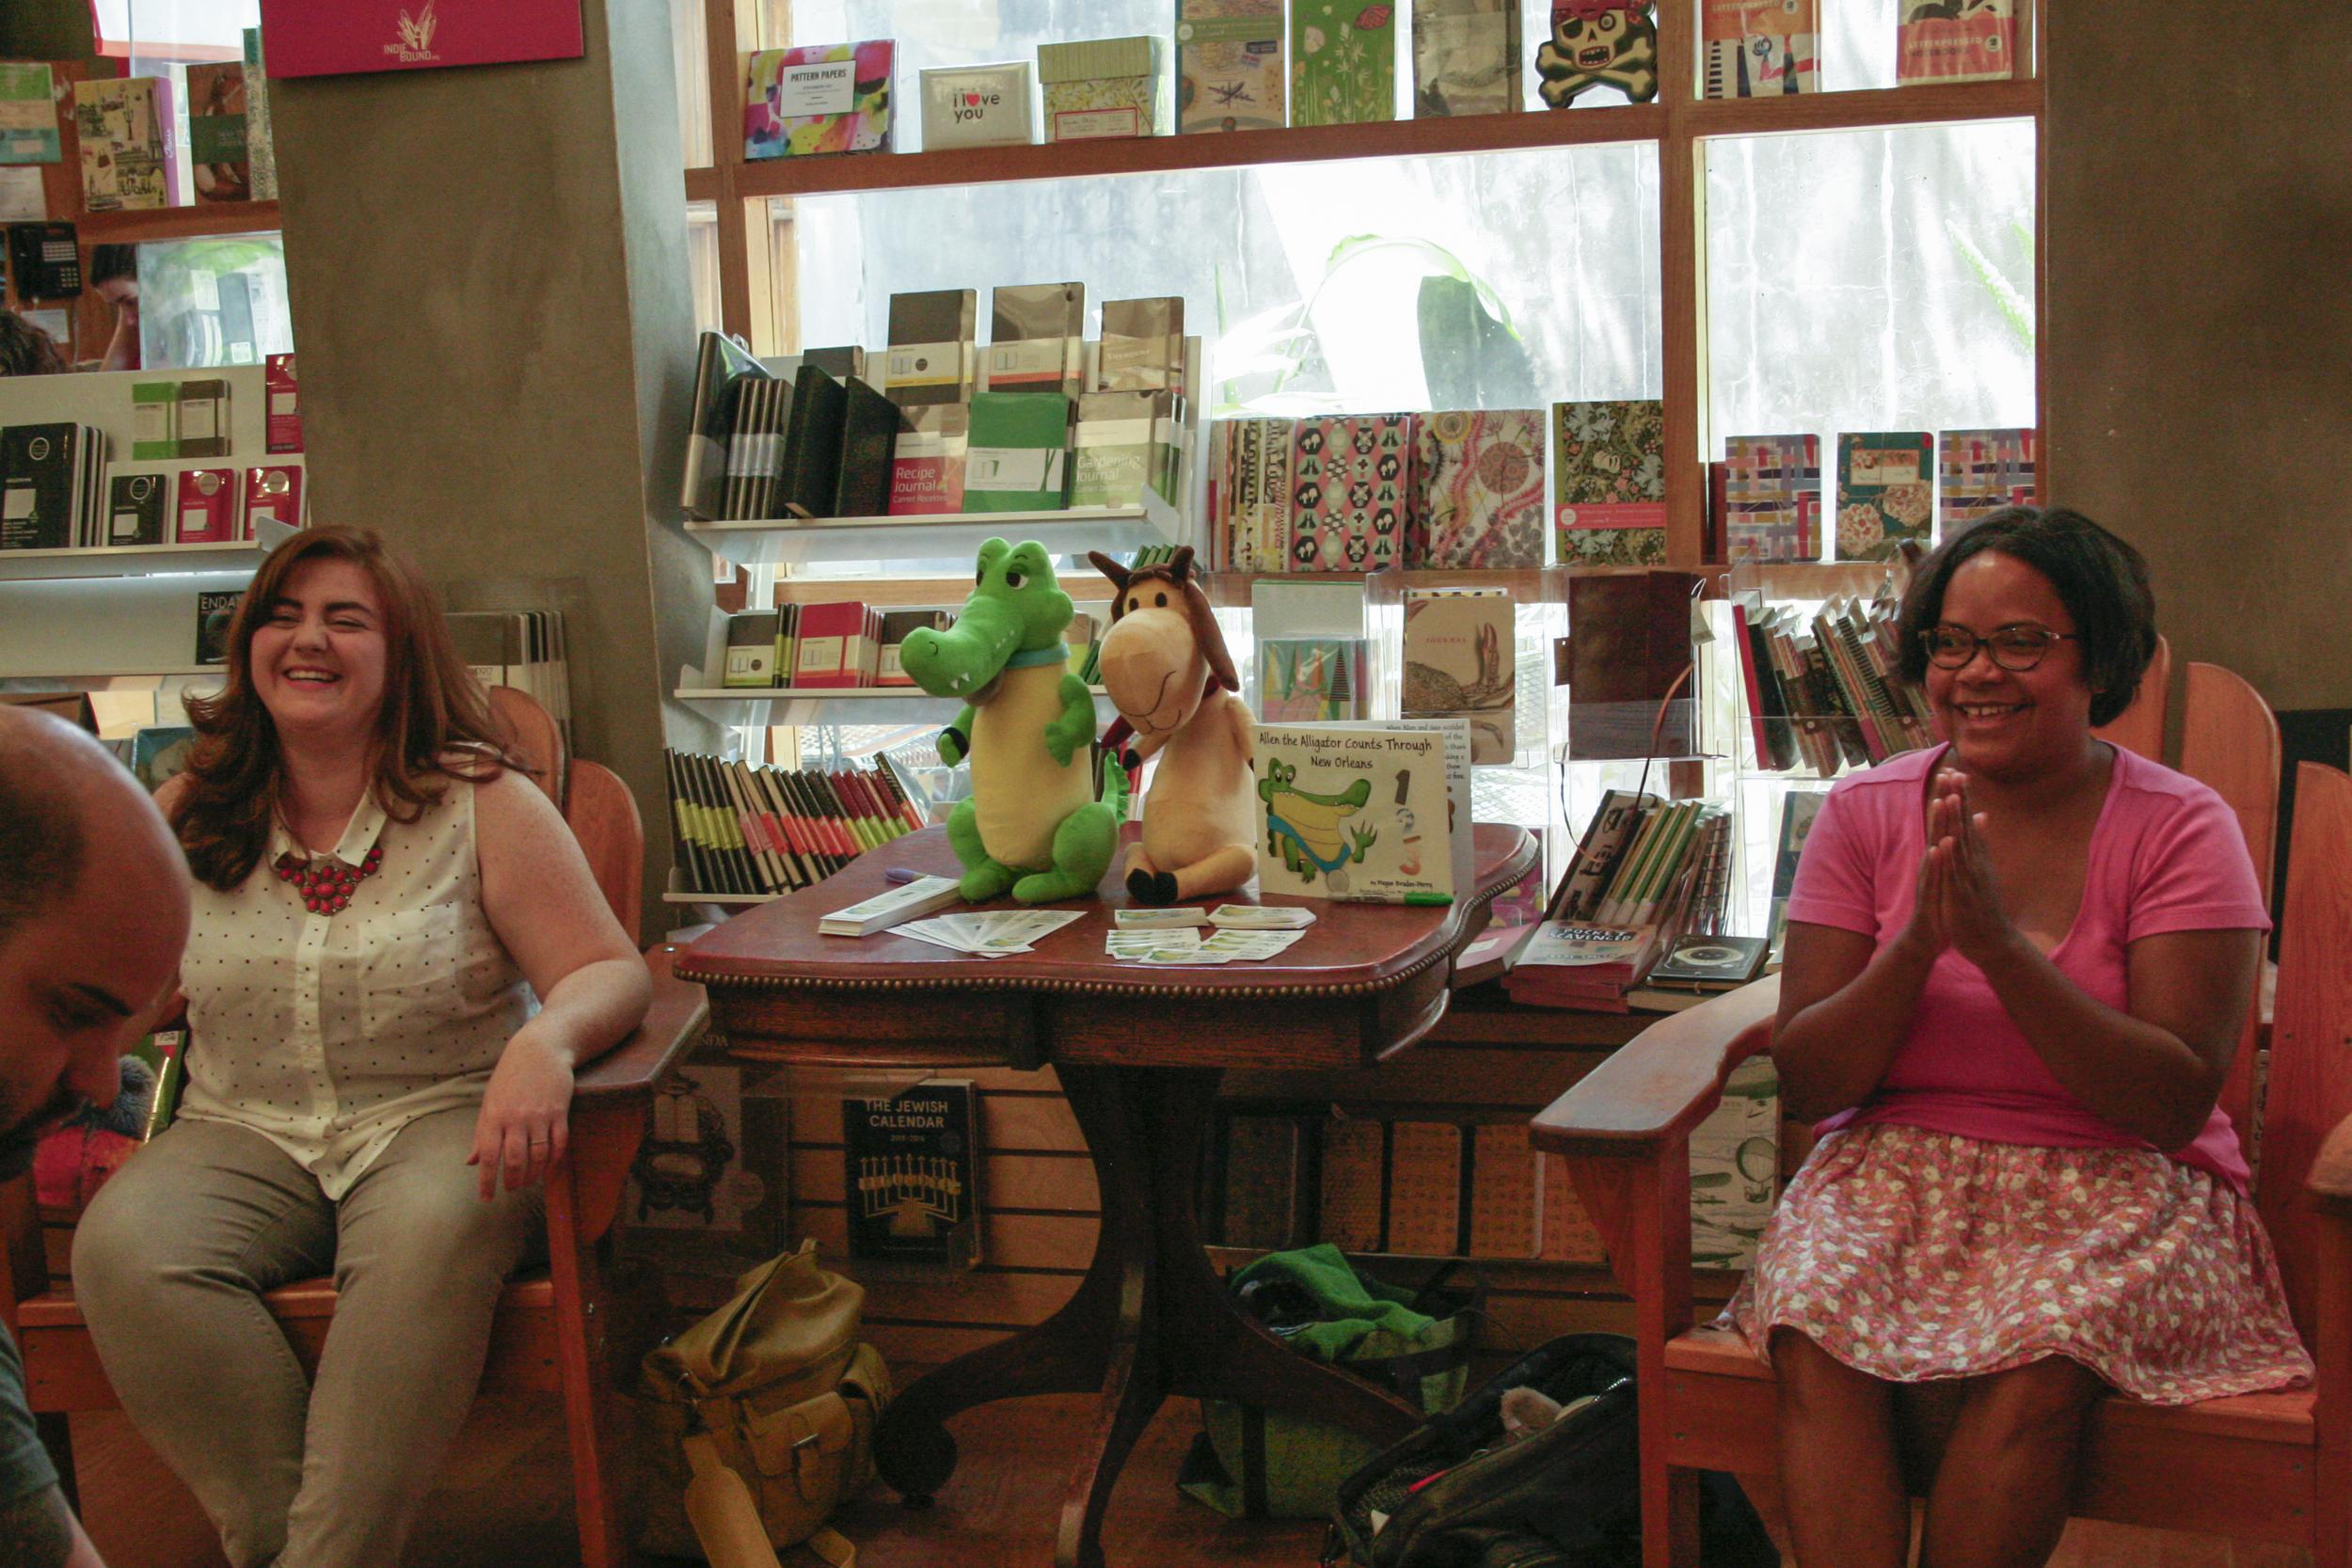 LazyLady-Octavia-Books-Allen-The-Alligator-Signing